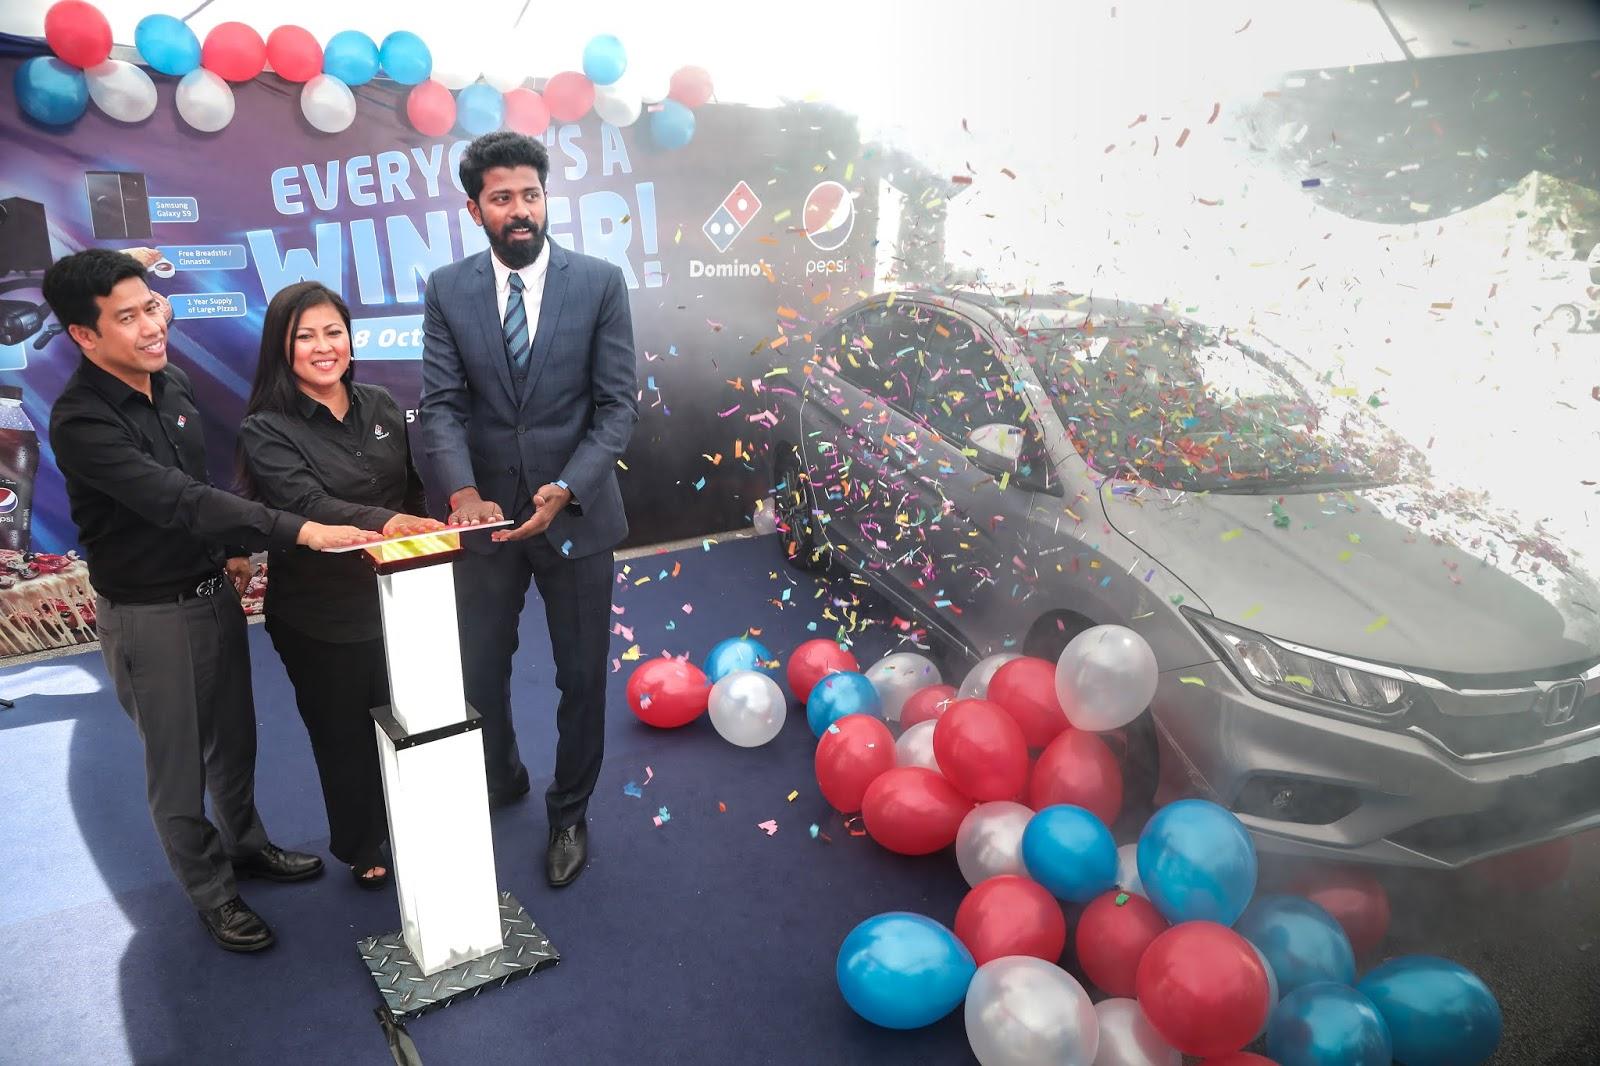 Domino's Pizza & Pepsi Black  Memberi Ganjaran dengan Hadiah Bernilai RM130,000 kepada Pelanggannya  Hadiah Utama Honda City Untuk Direbut